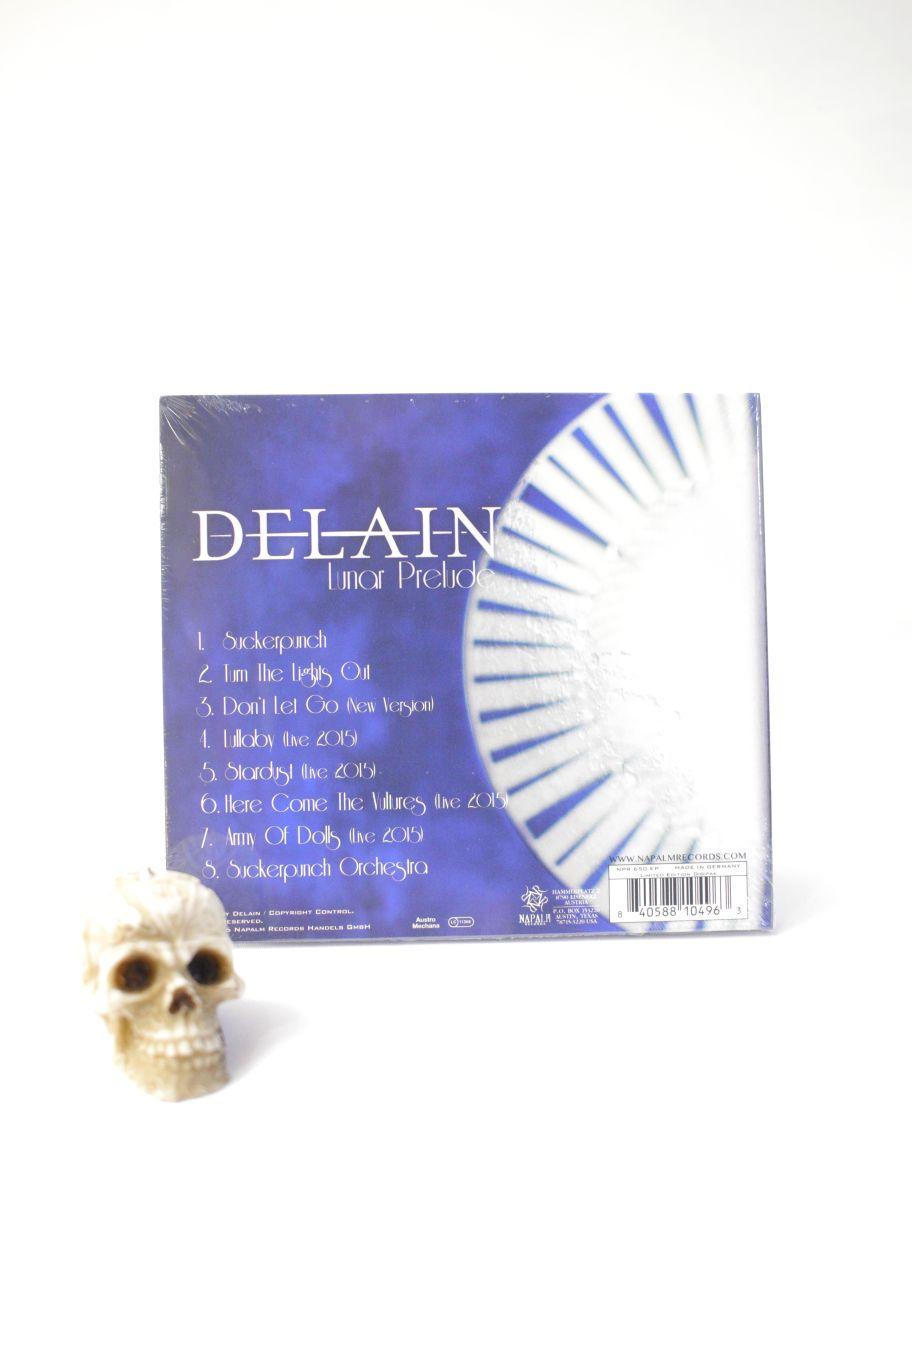 CD DELAIN LUNAR PRELUDE